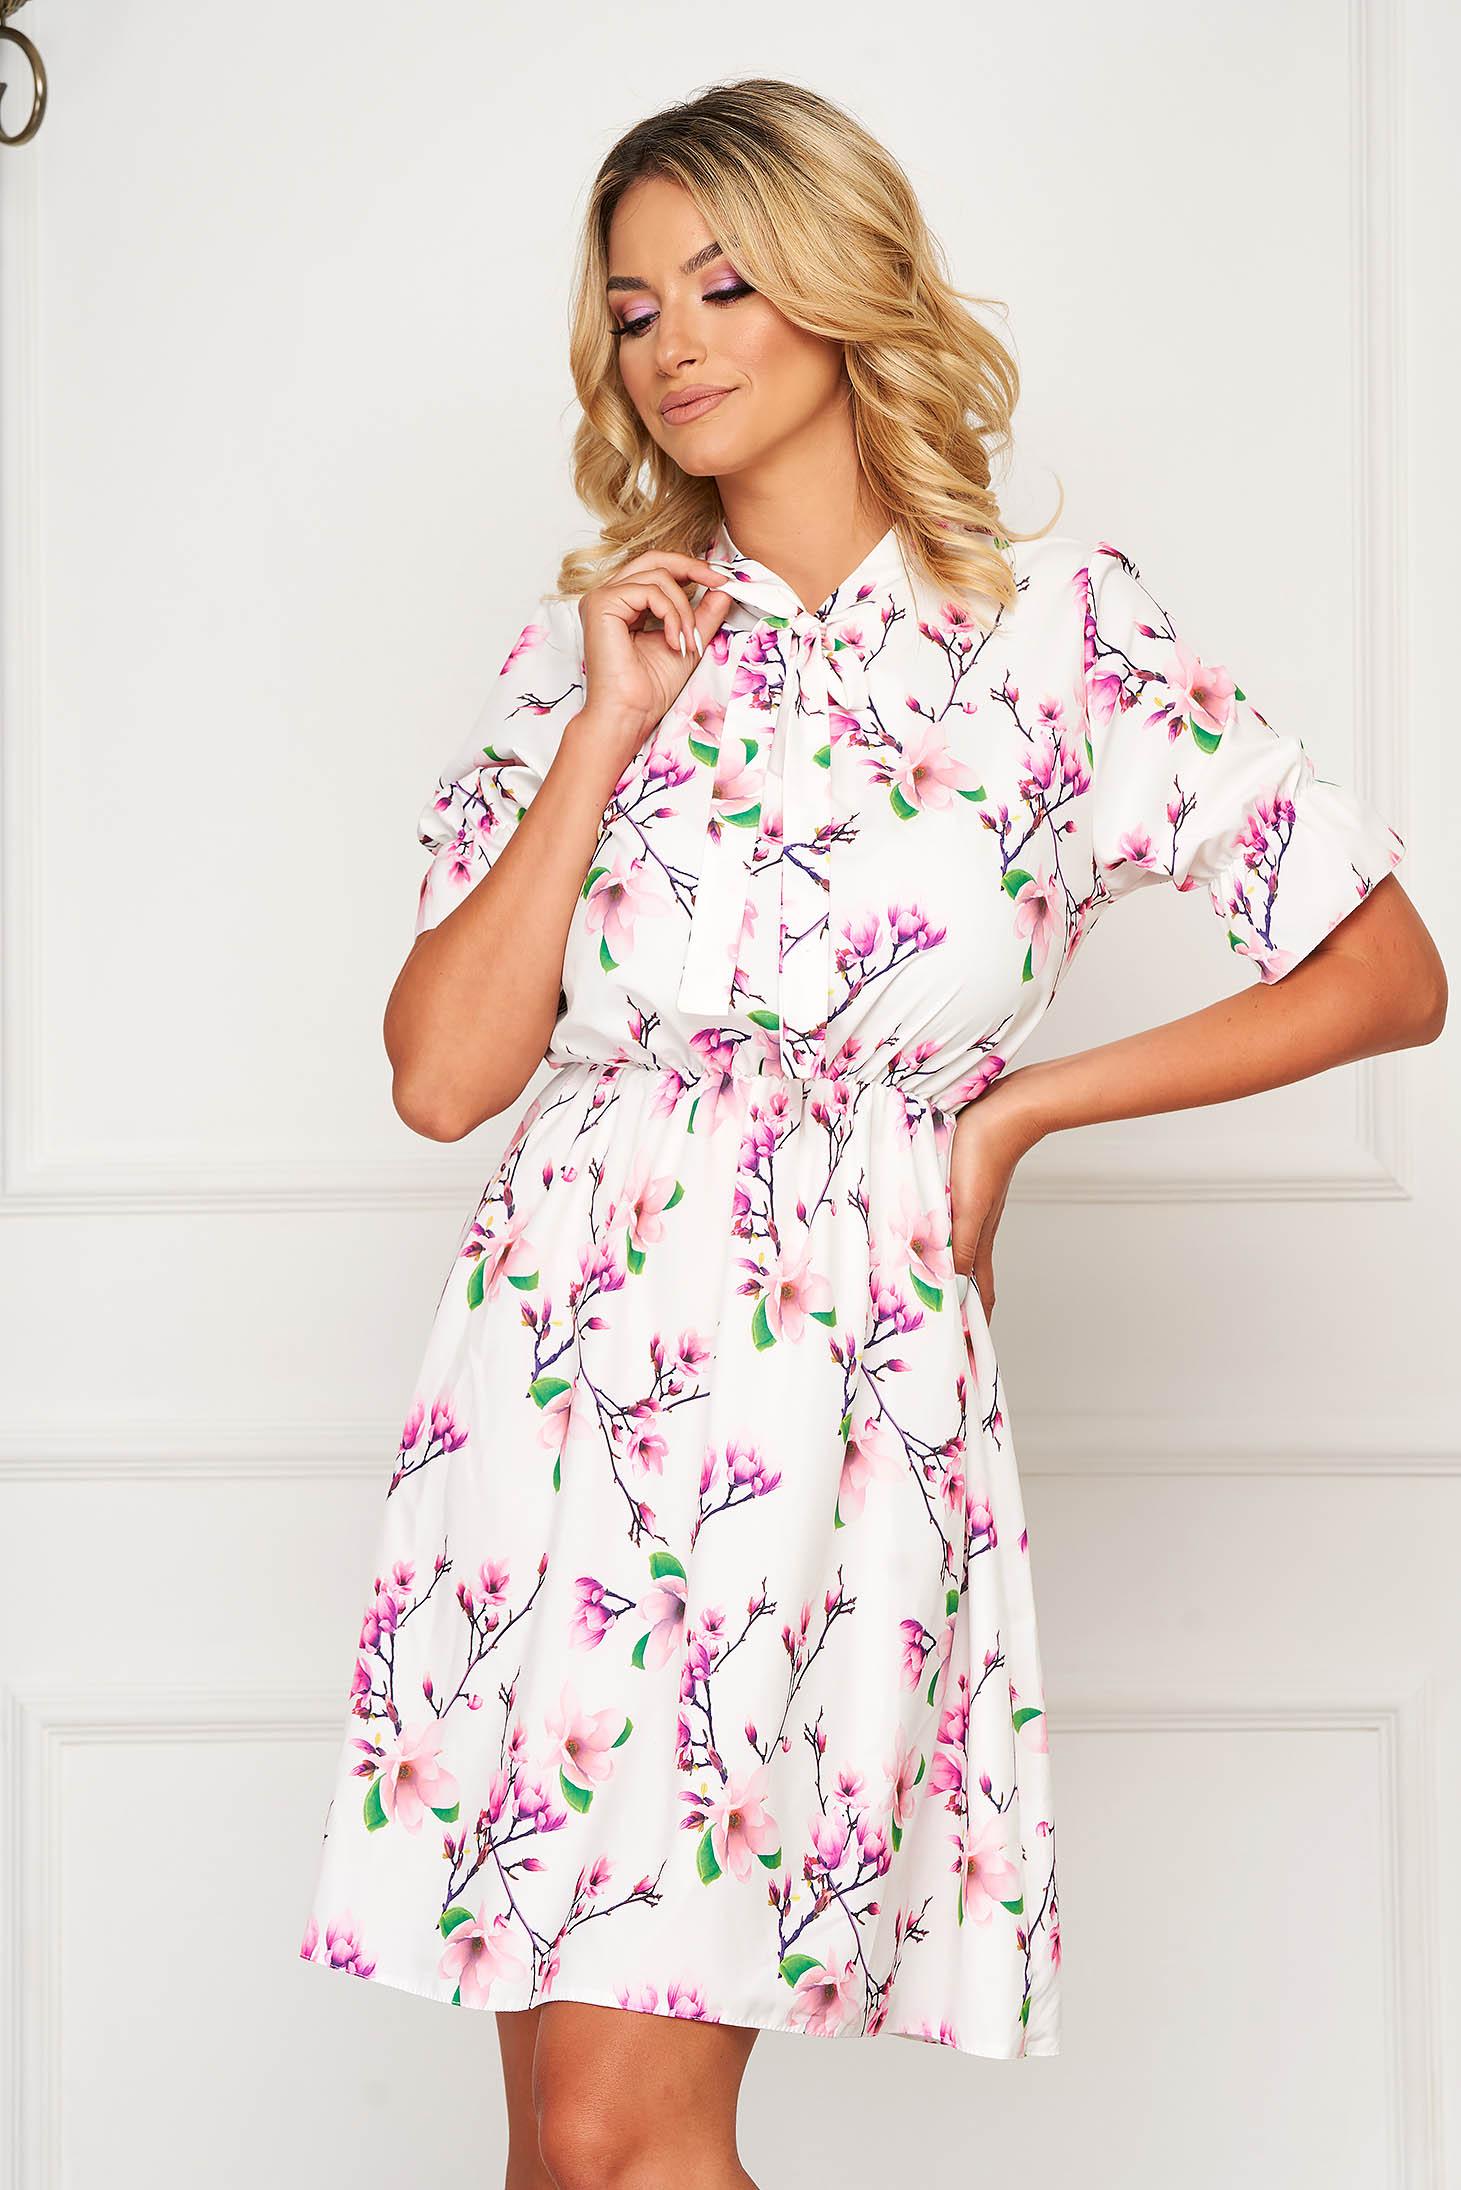 White dress short cut daily thin fabric cloche with elastic waist short sleeves